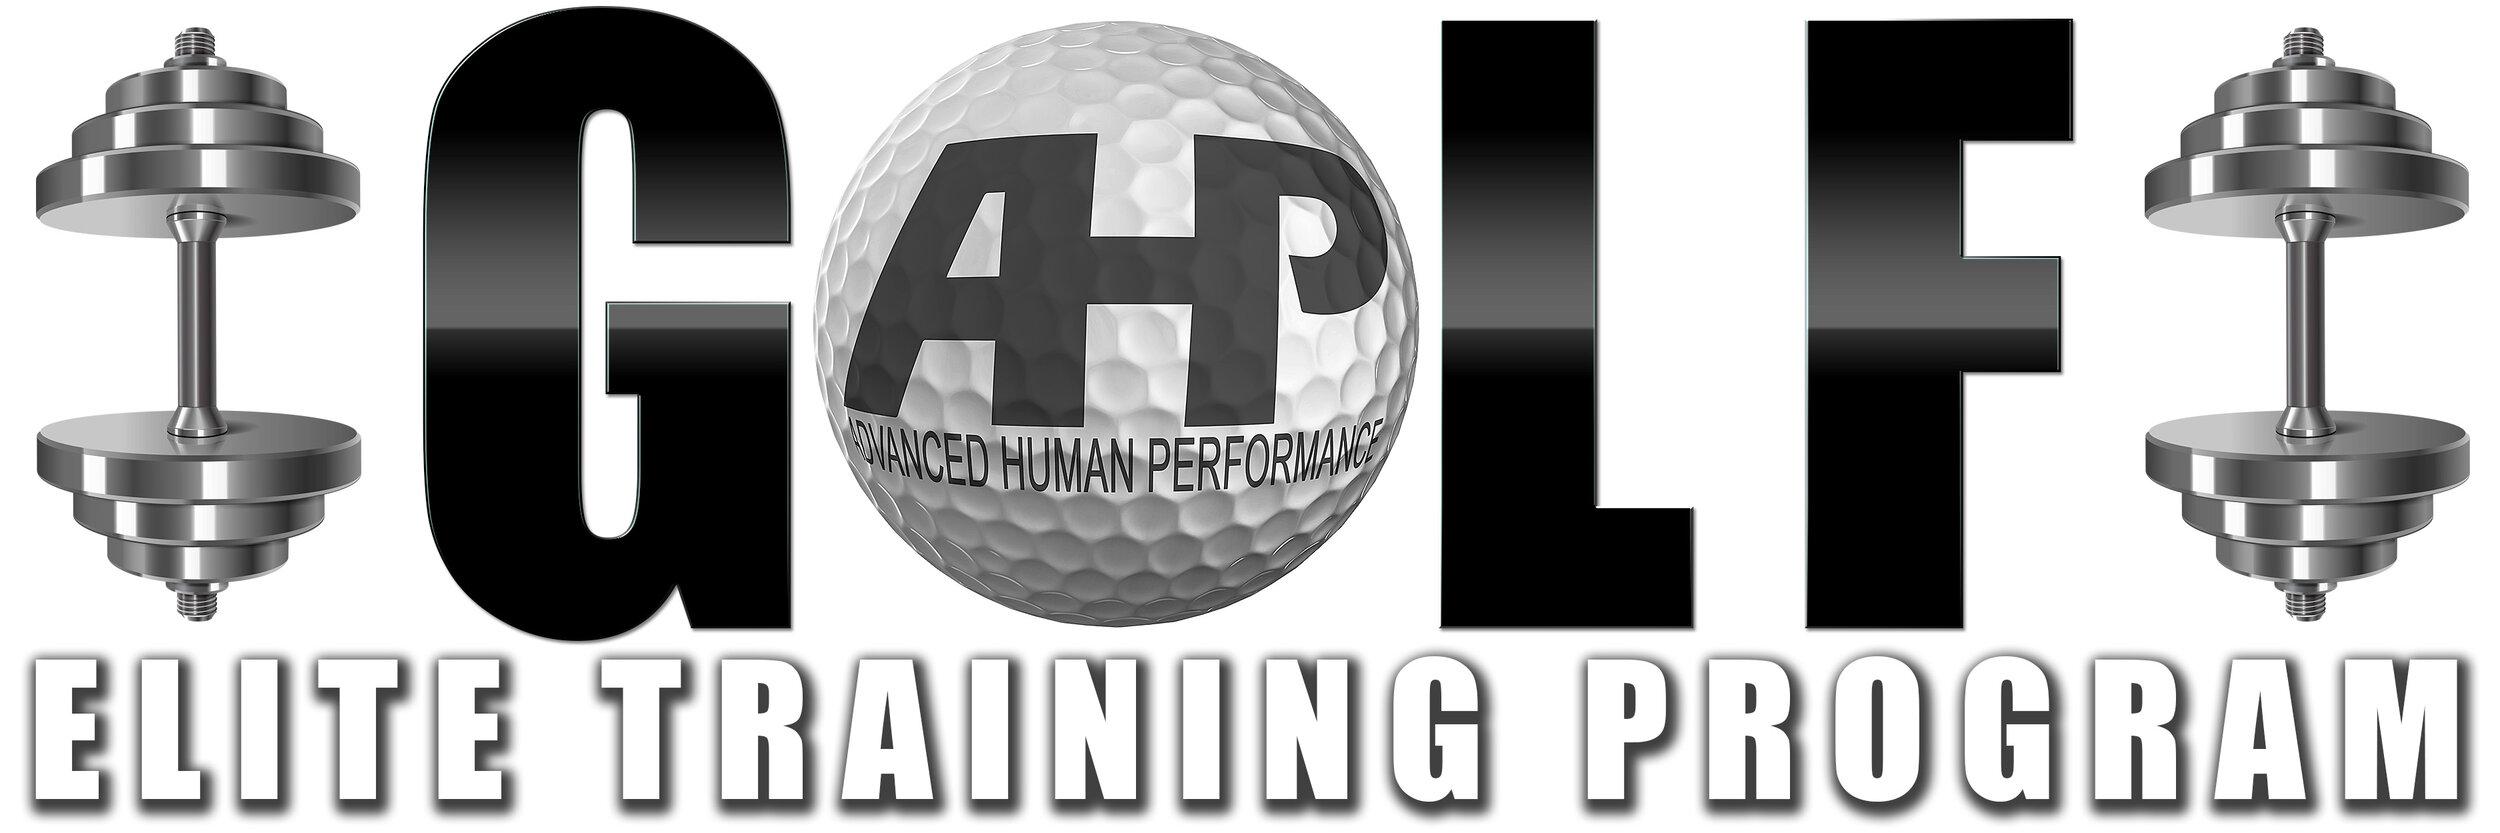 Golf Training Program Title (AHP).jpg